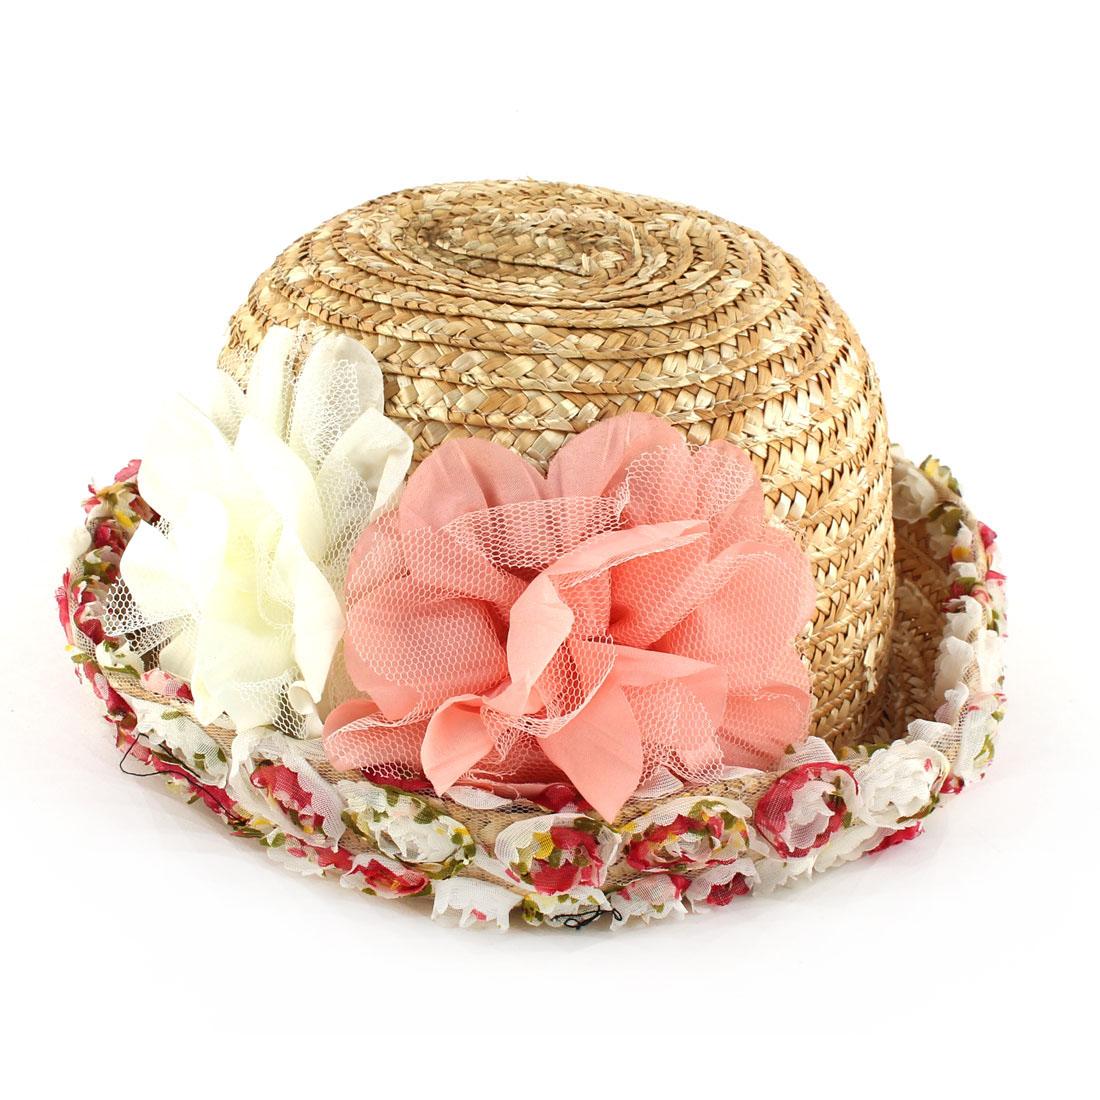 Lady Straw Braided Cap Flower Lace Rolled Brim Summer Beach Sun Hat Beige